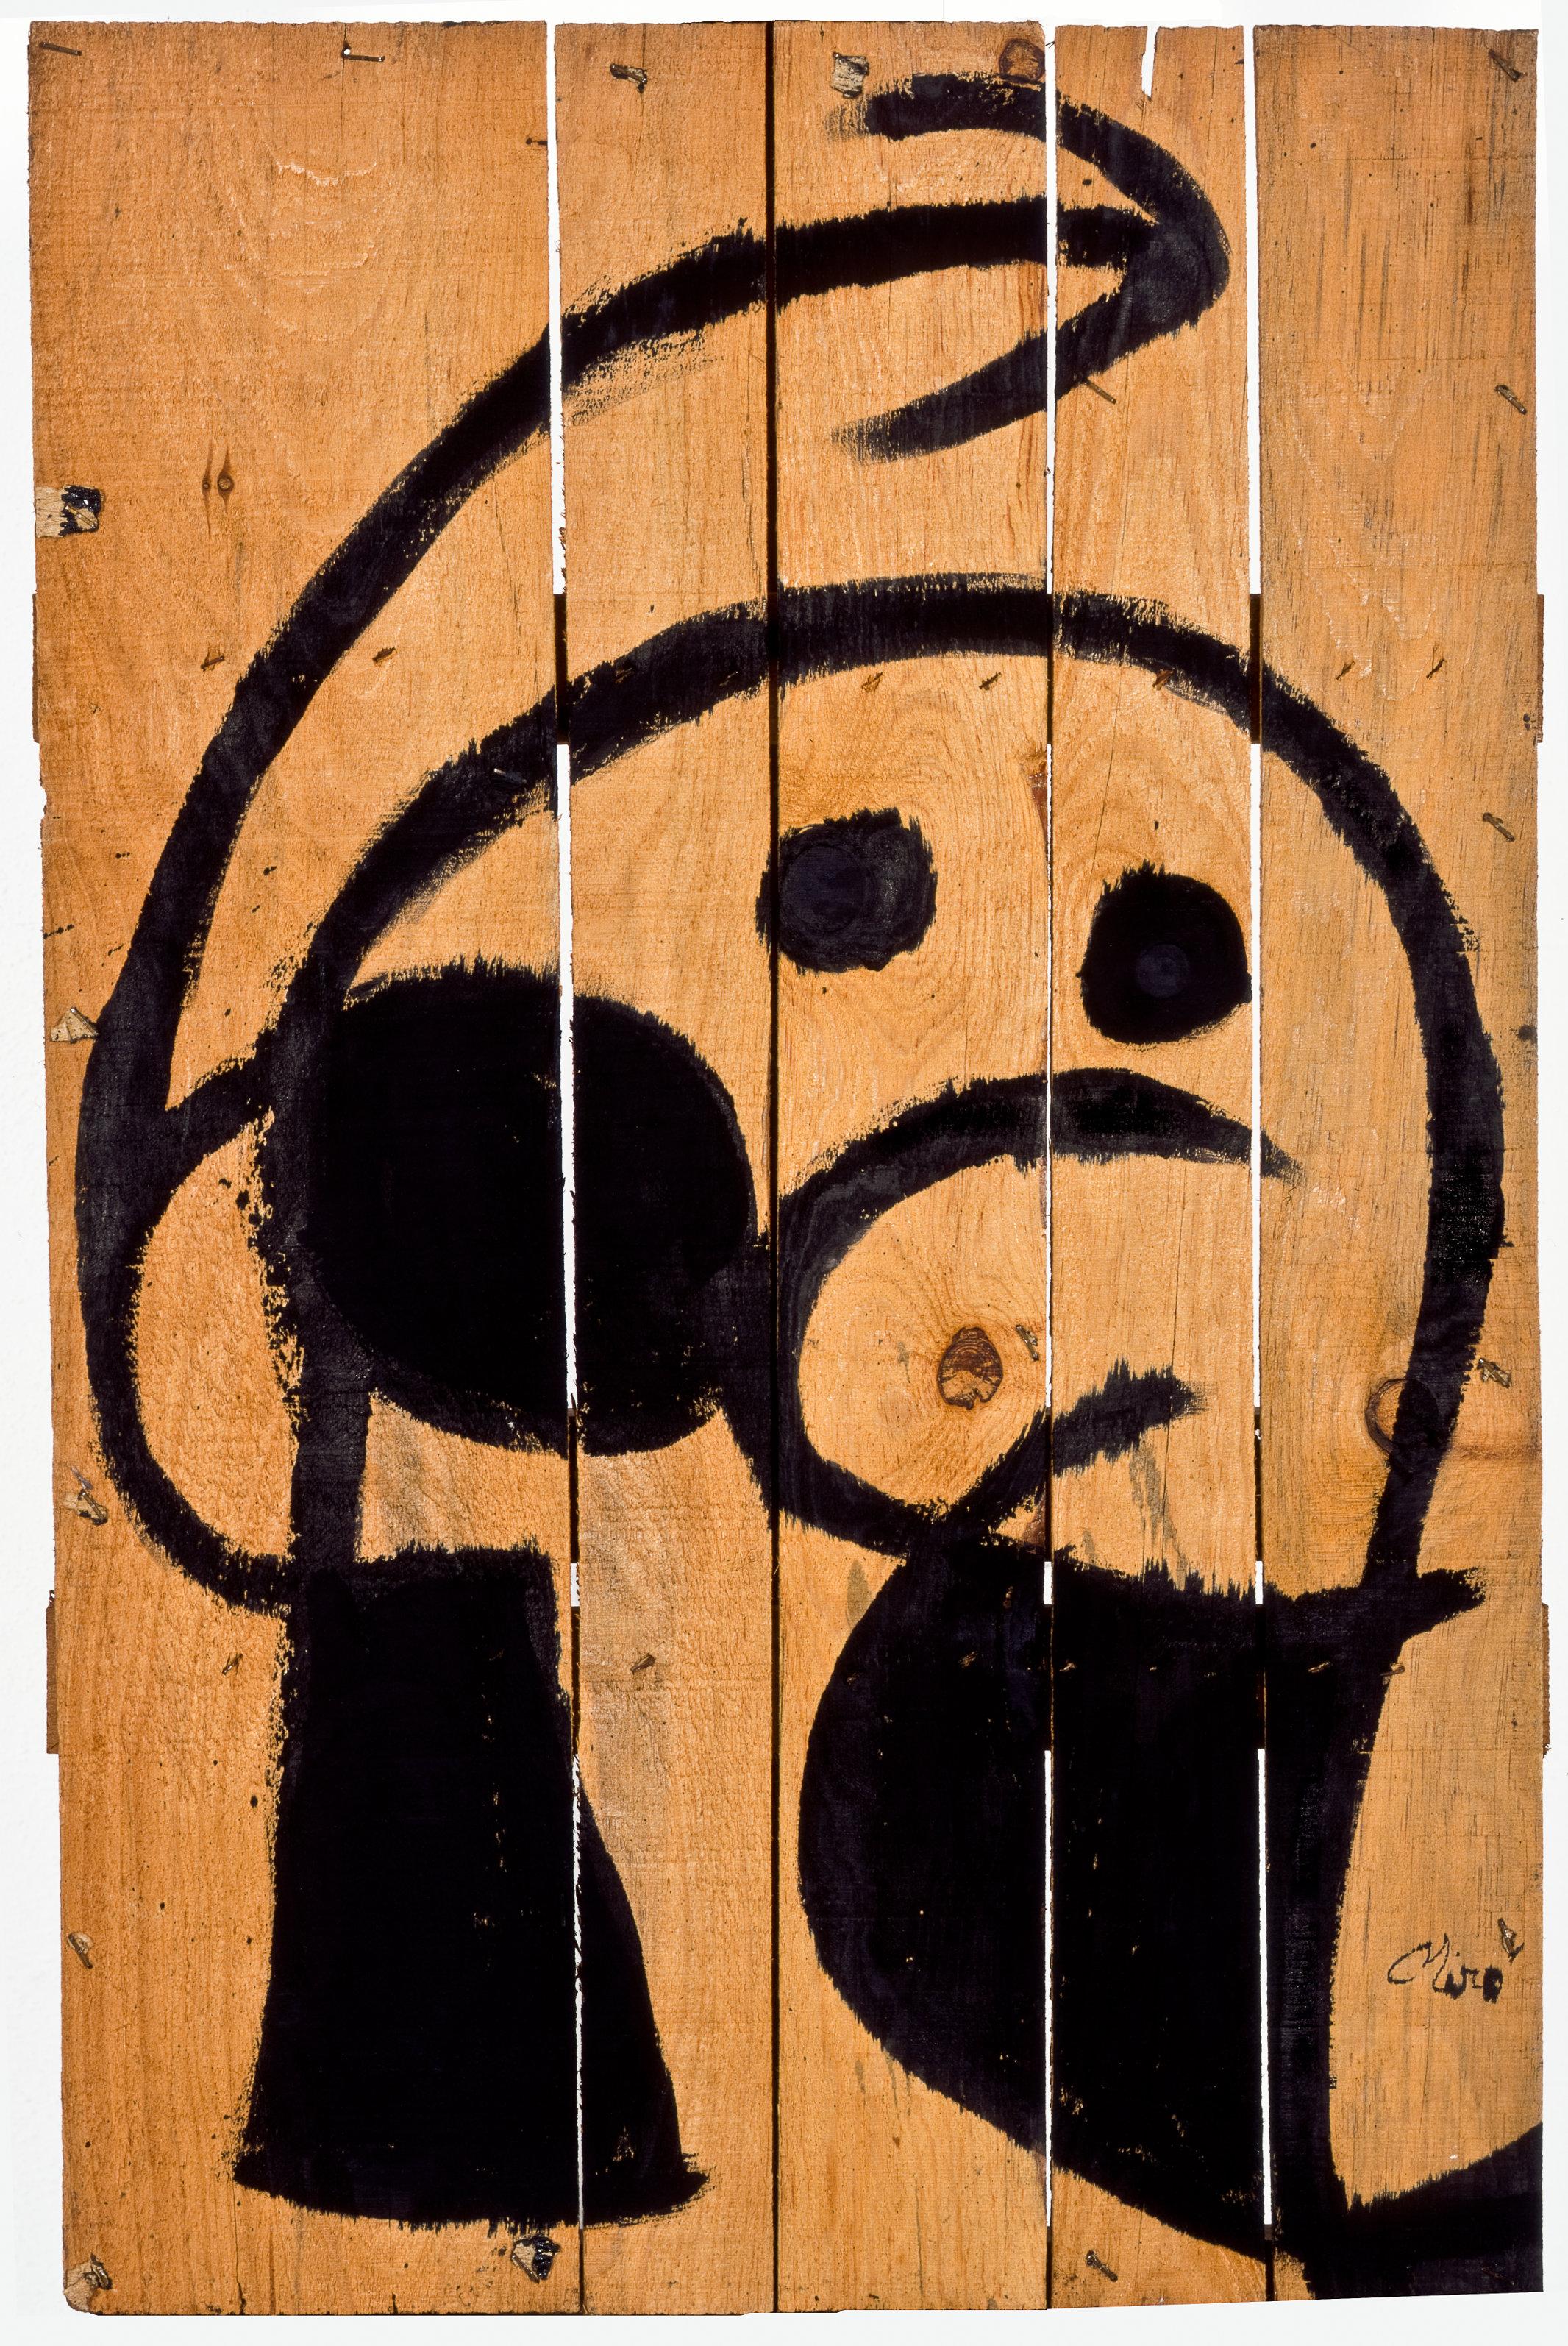 Joan Miró Personaggio, uccello, 1976 Olio su tavola